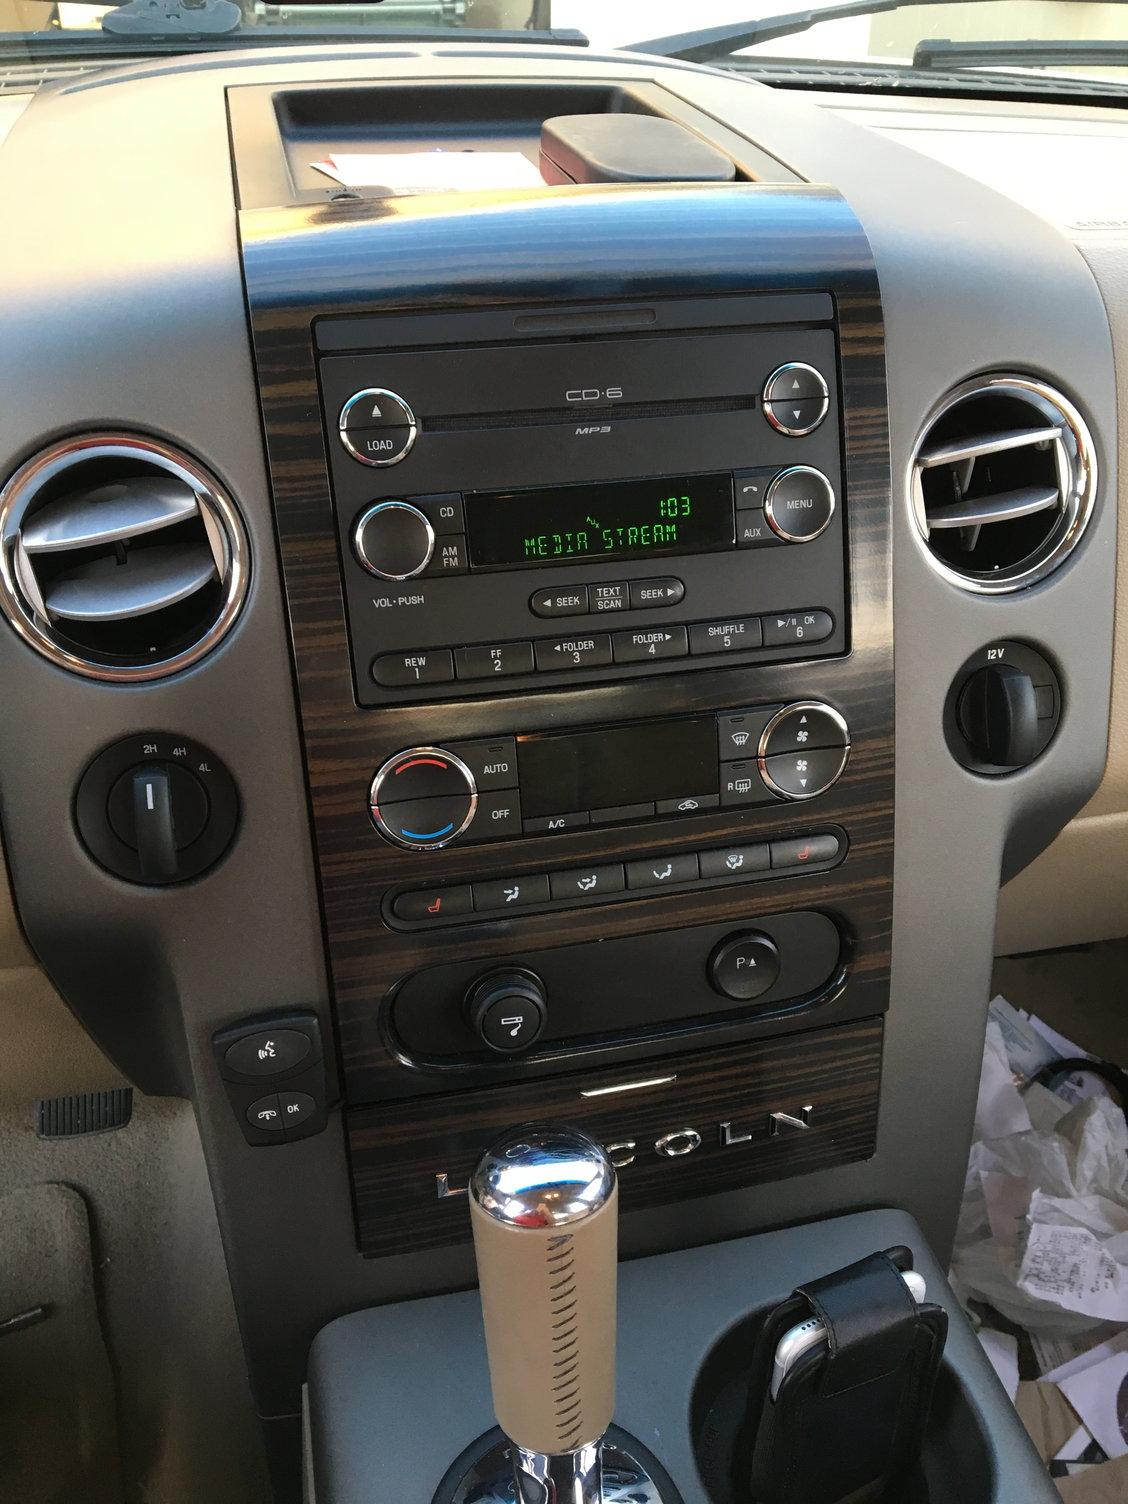 2008 f150 phone button on radio